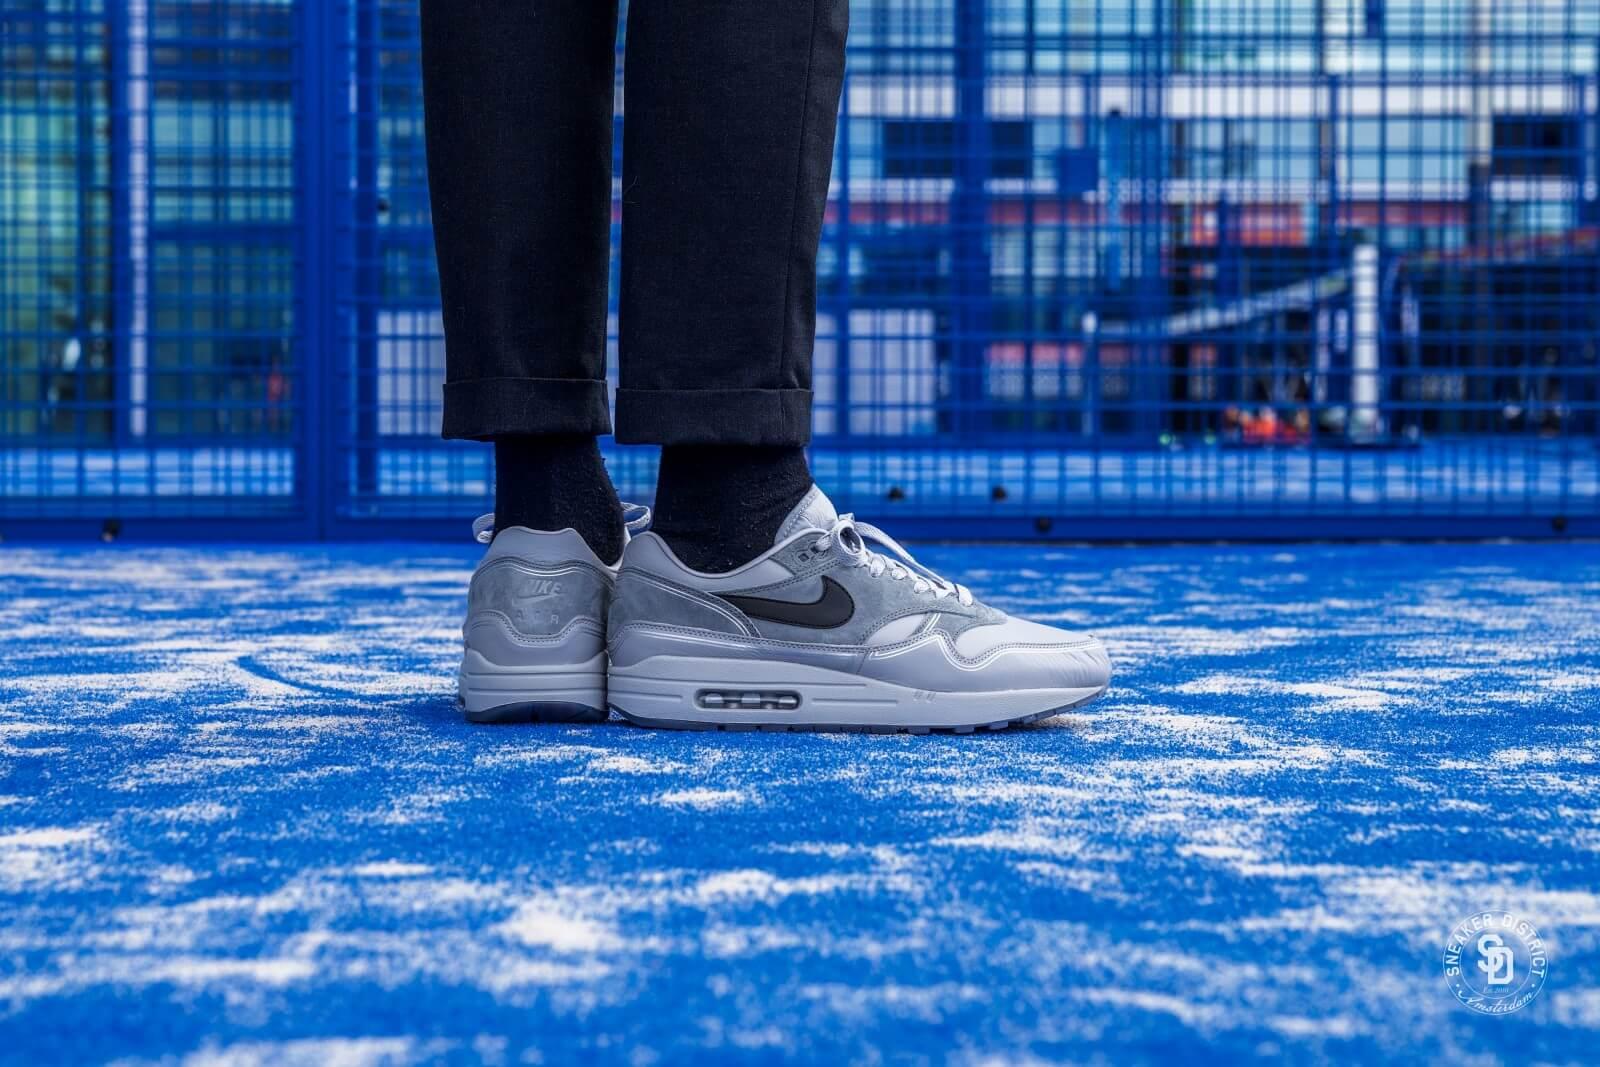 Nike Air Max 1 By Night Wolf Grey/Black